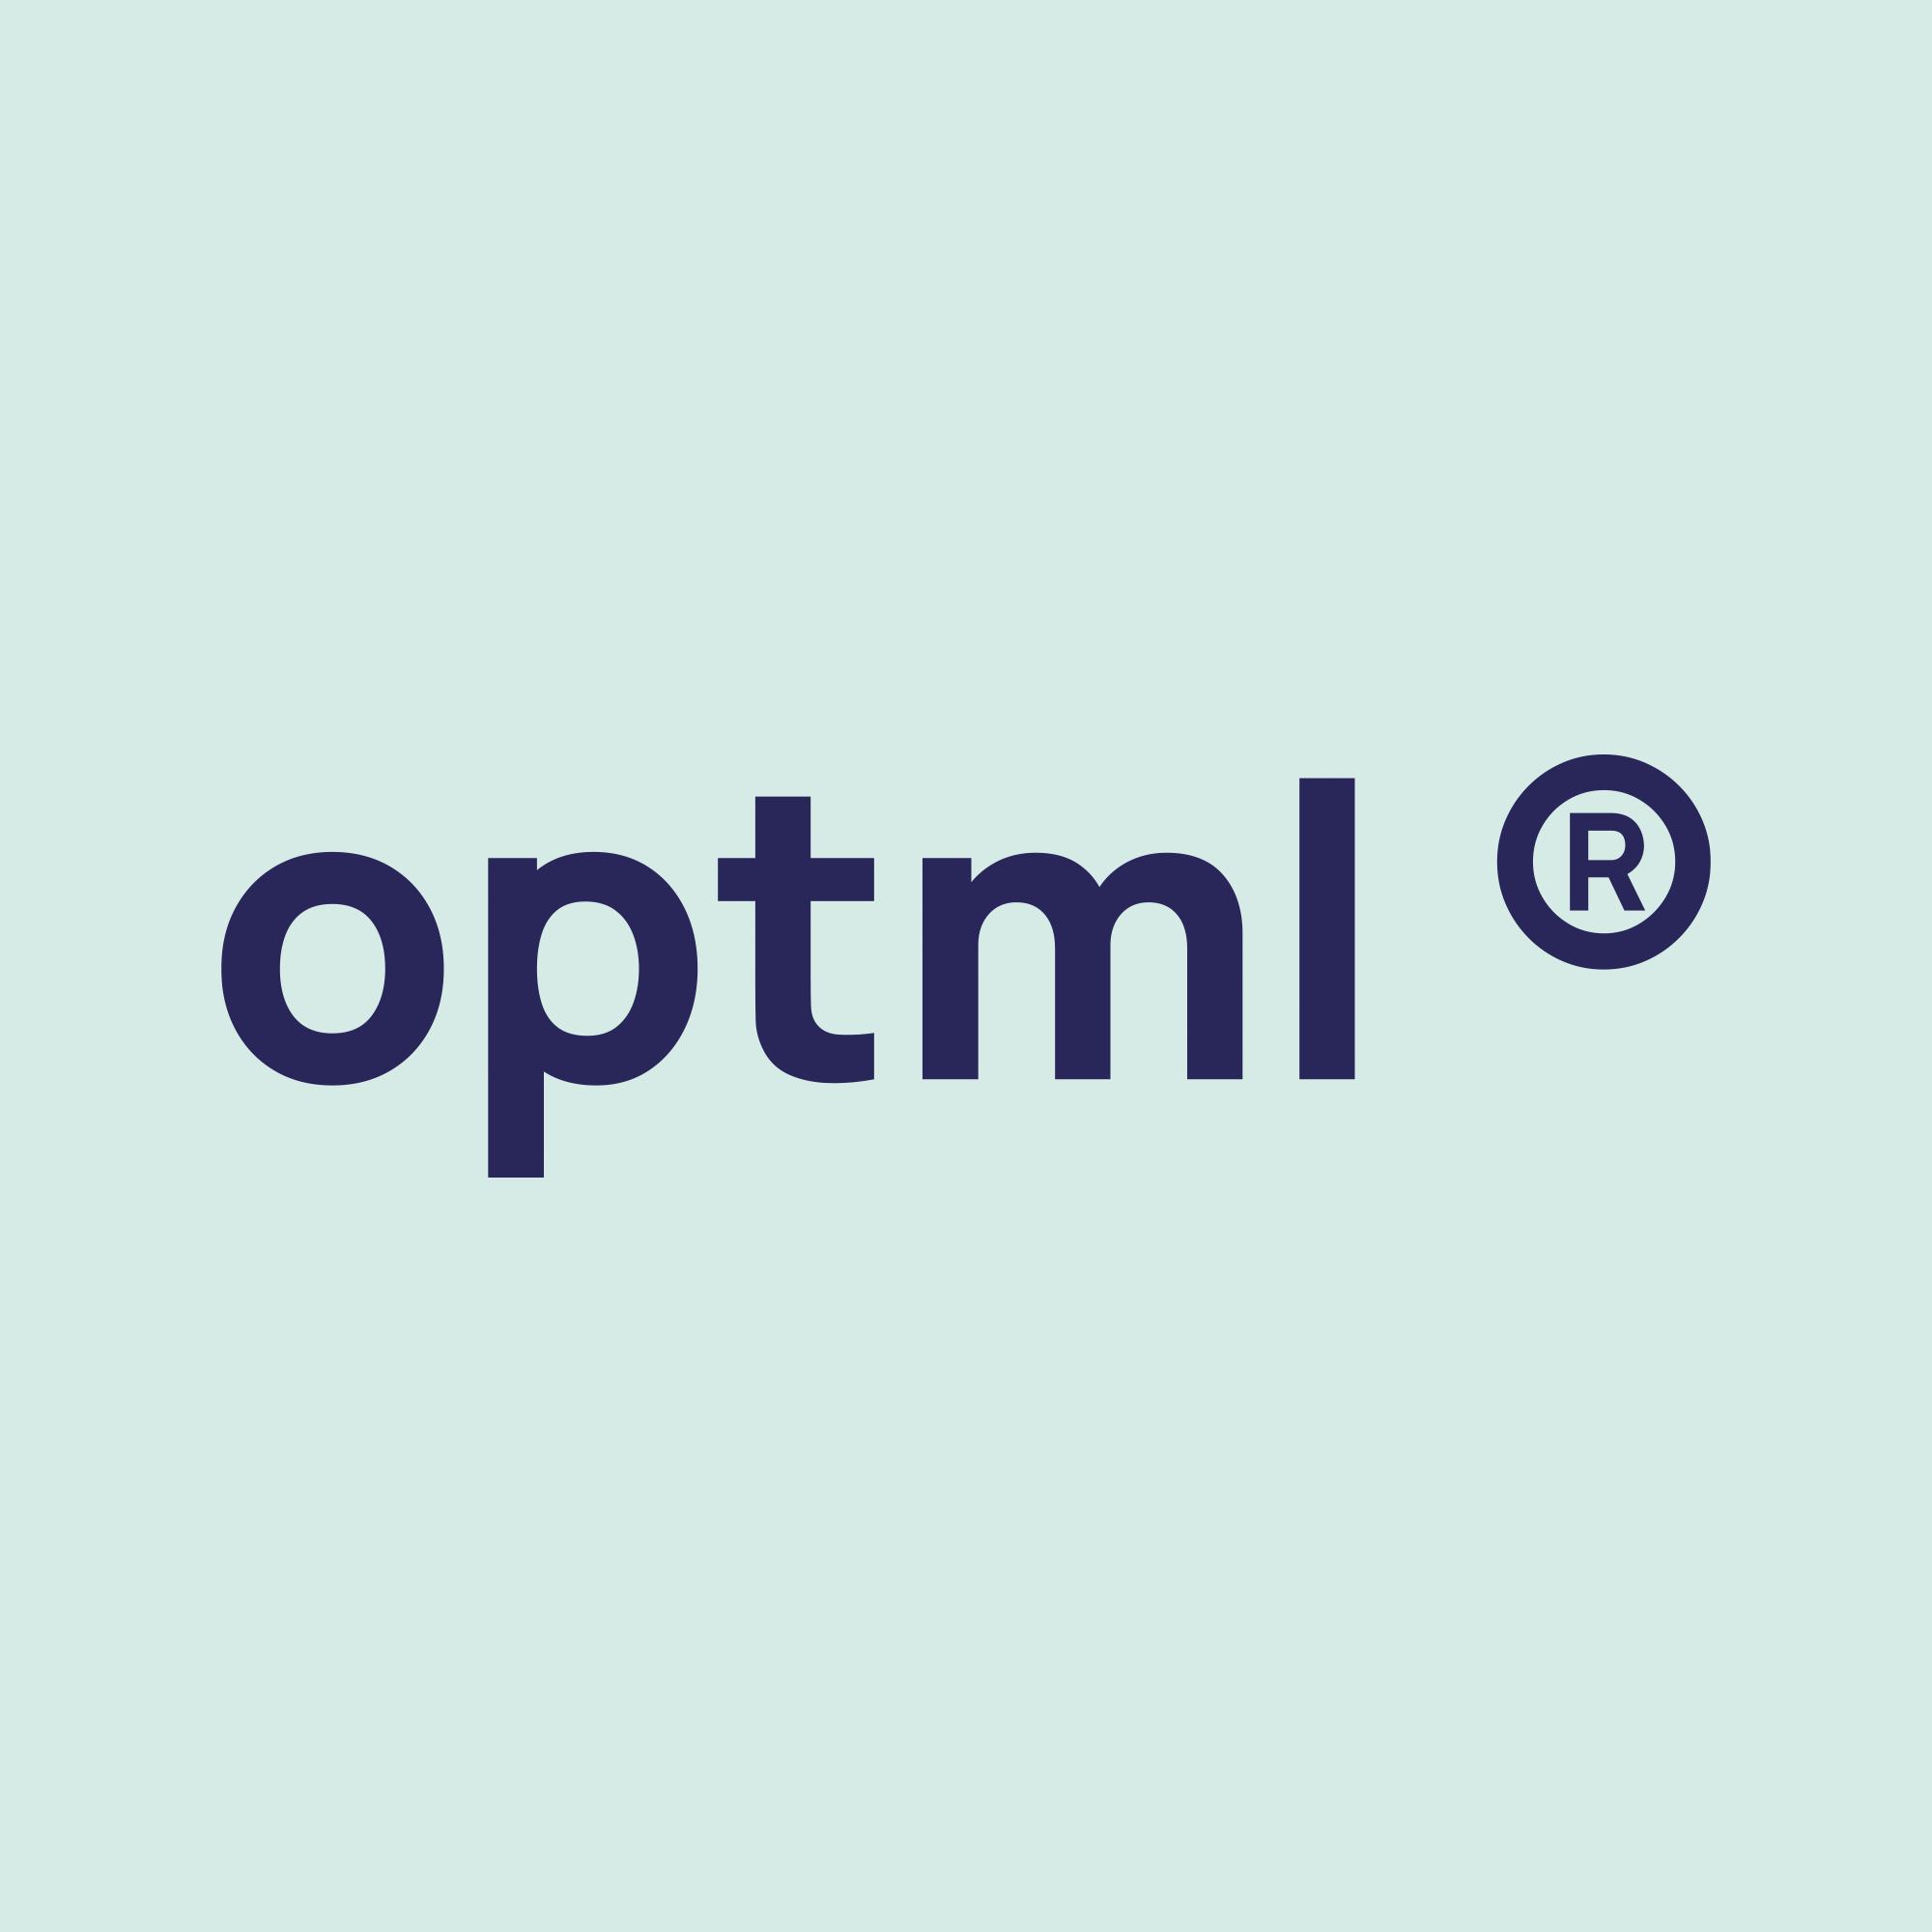 Read optml Reviews